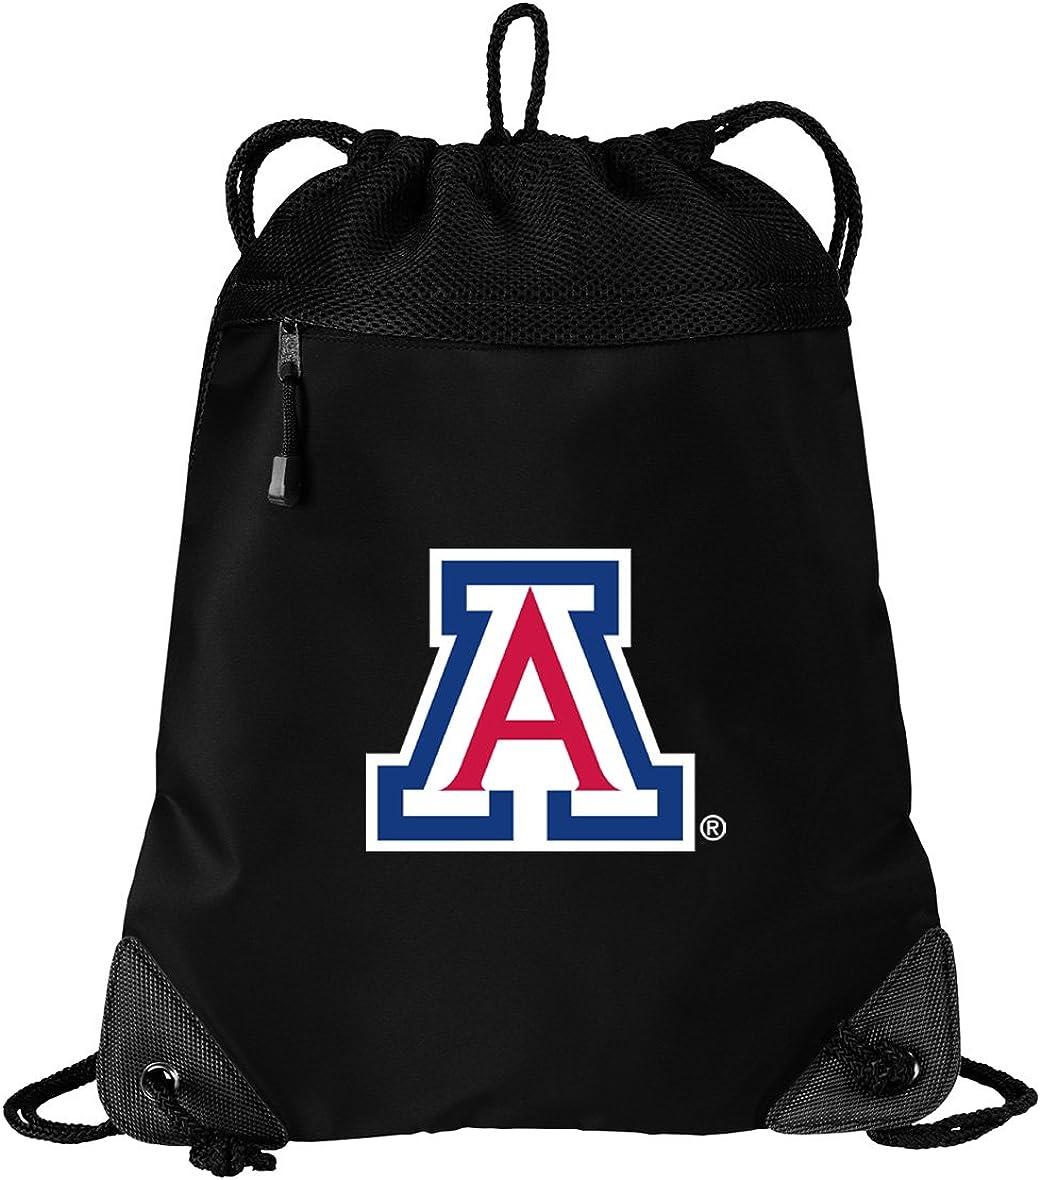 Broad Bay University of Houston Drawstring Bag UH Cinch Pack Backpack Unique MESH /& Microfiber